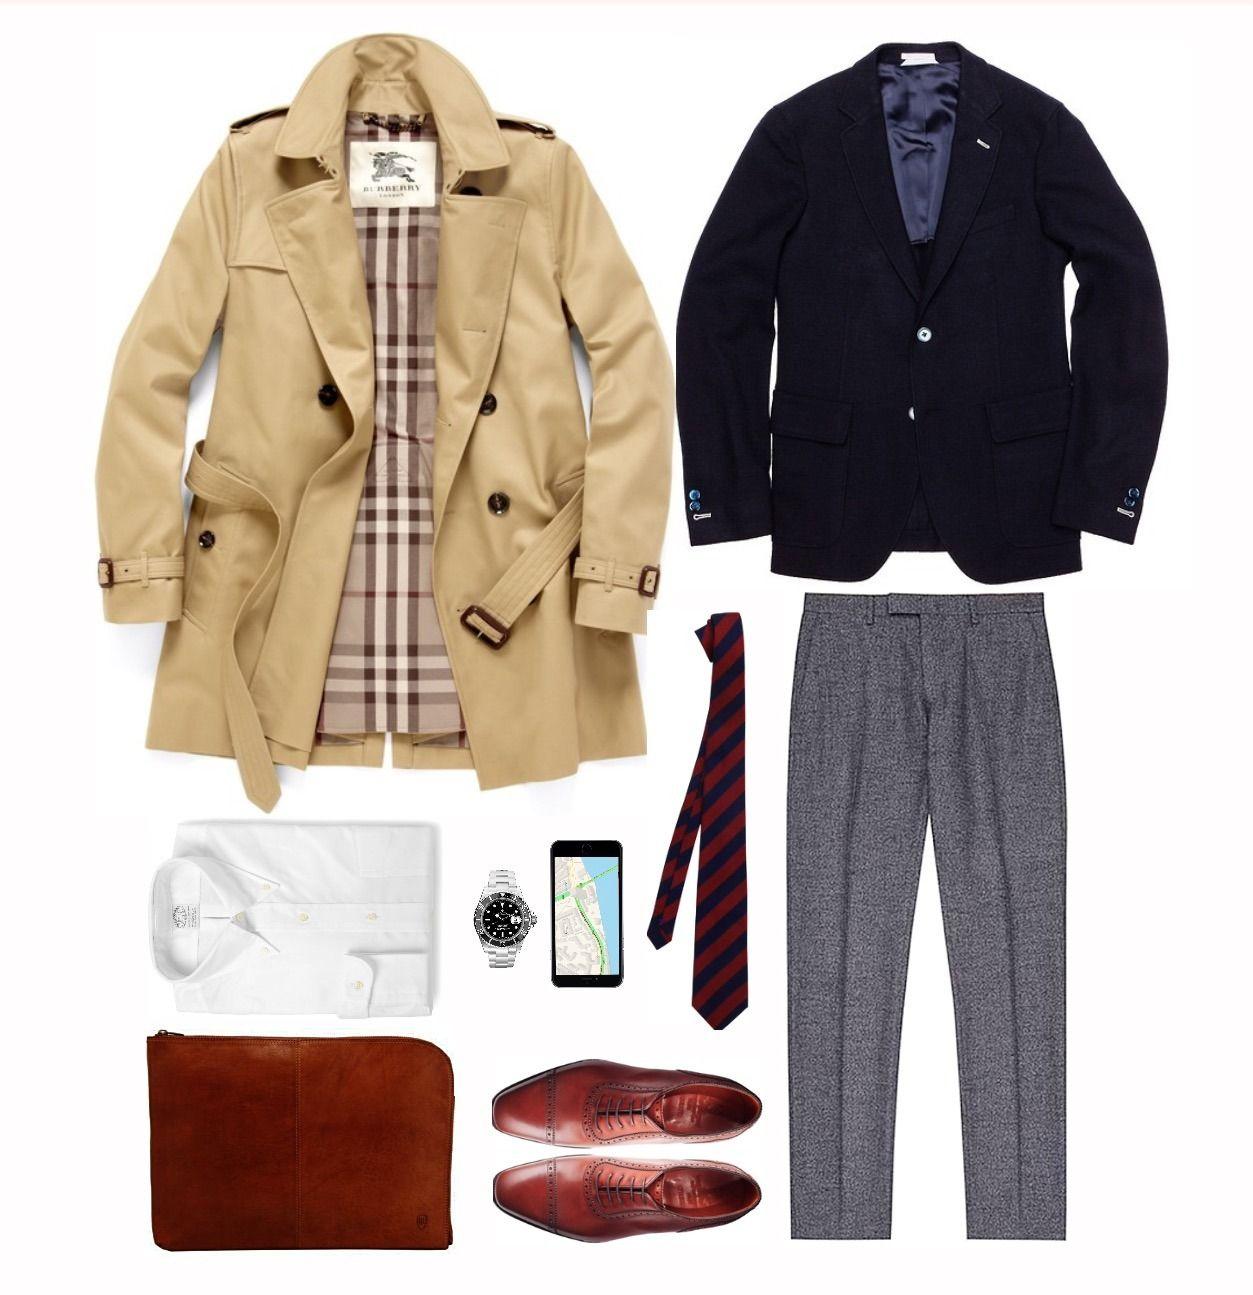 Raincoat: Burberry. Blazer: Hackett. Trousers: Reiss. Shoes: John Lobb